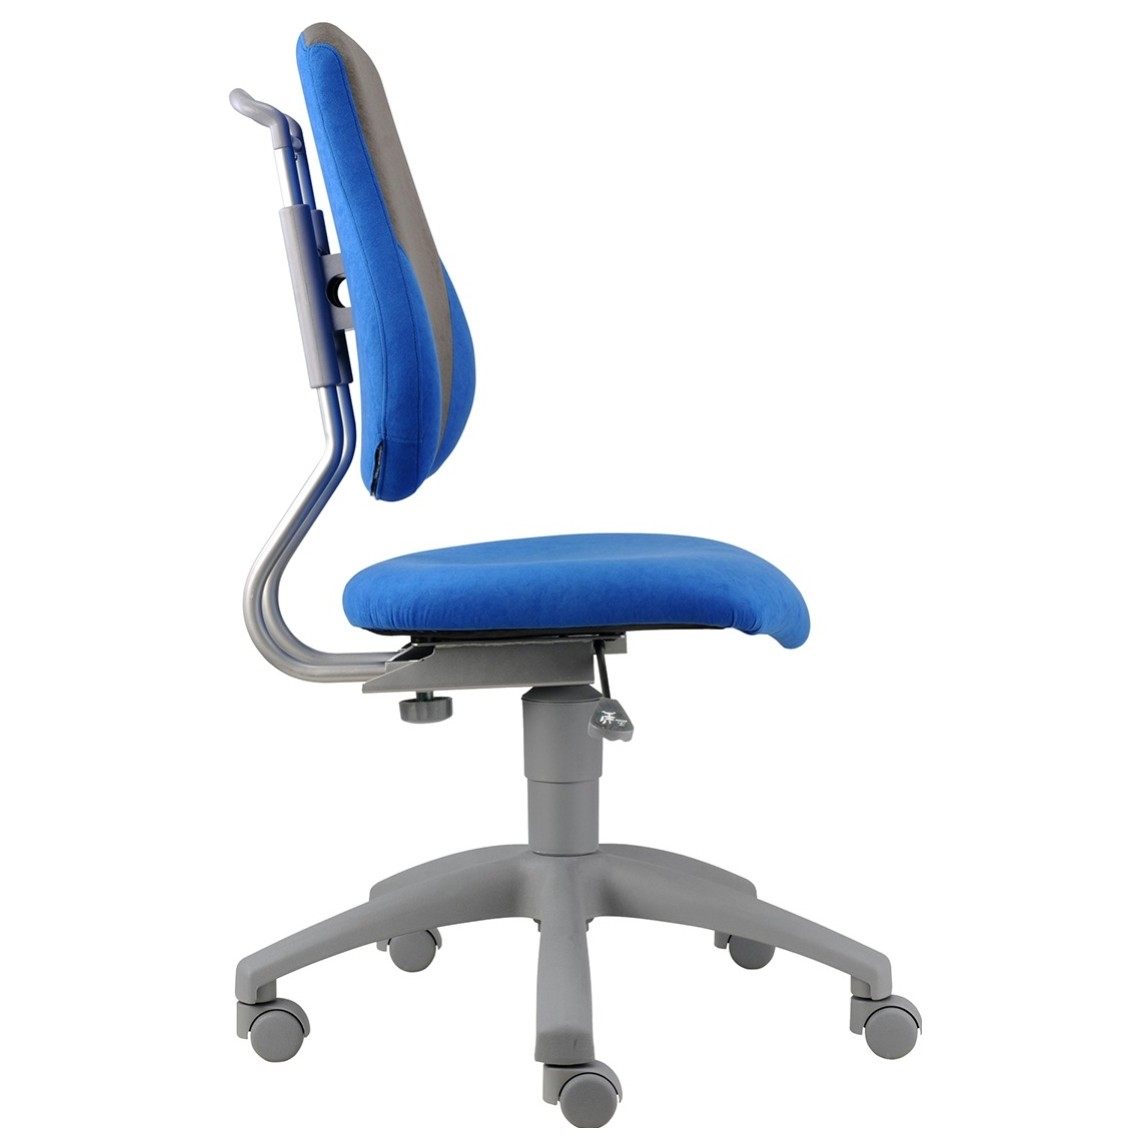 Sconto Detská stolička ELEN modrá/šedá Rastúca detská stolička.